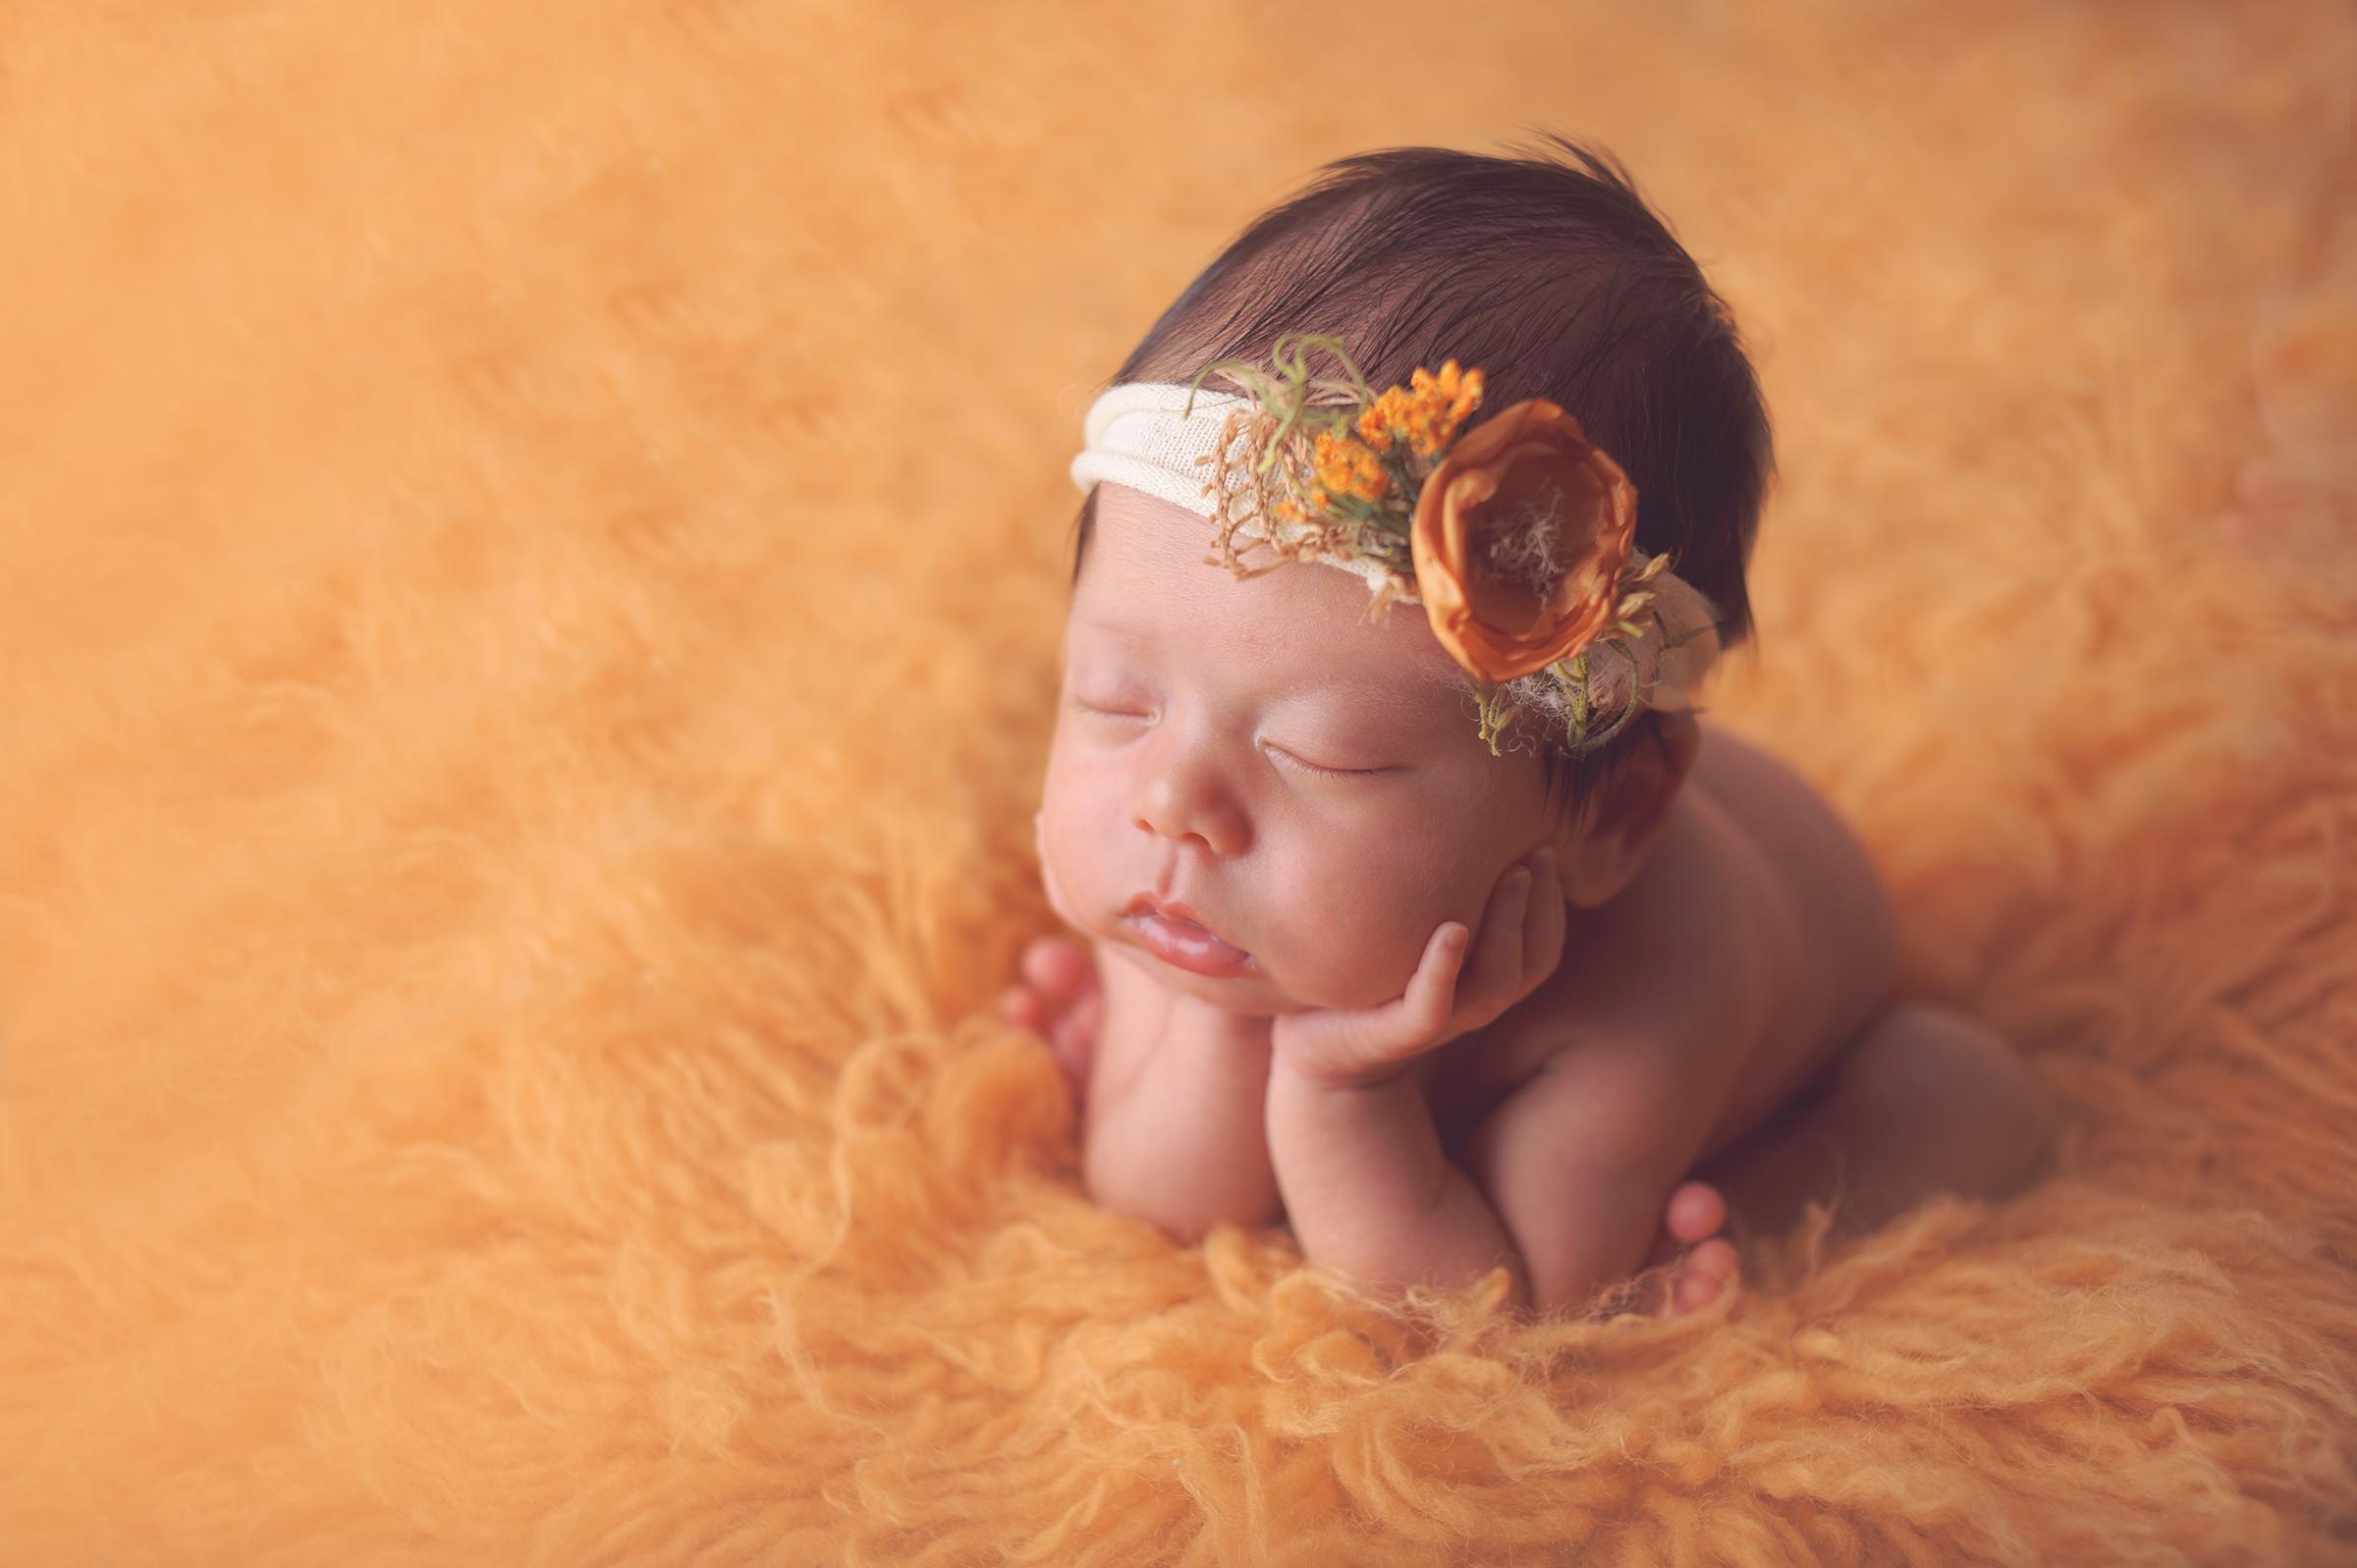 Newborn baby girl posed on yellow rug with cute headband in California newborn photography session